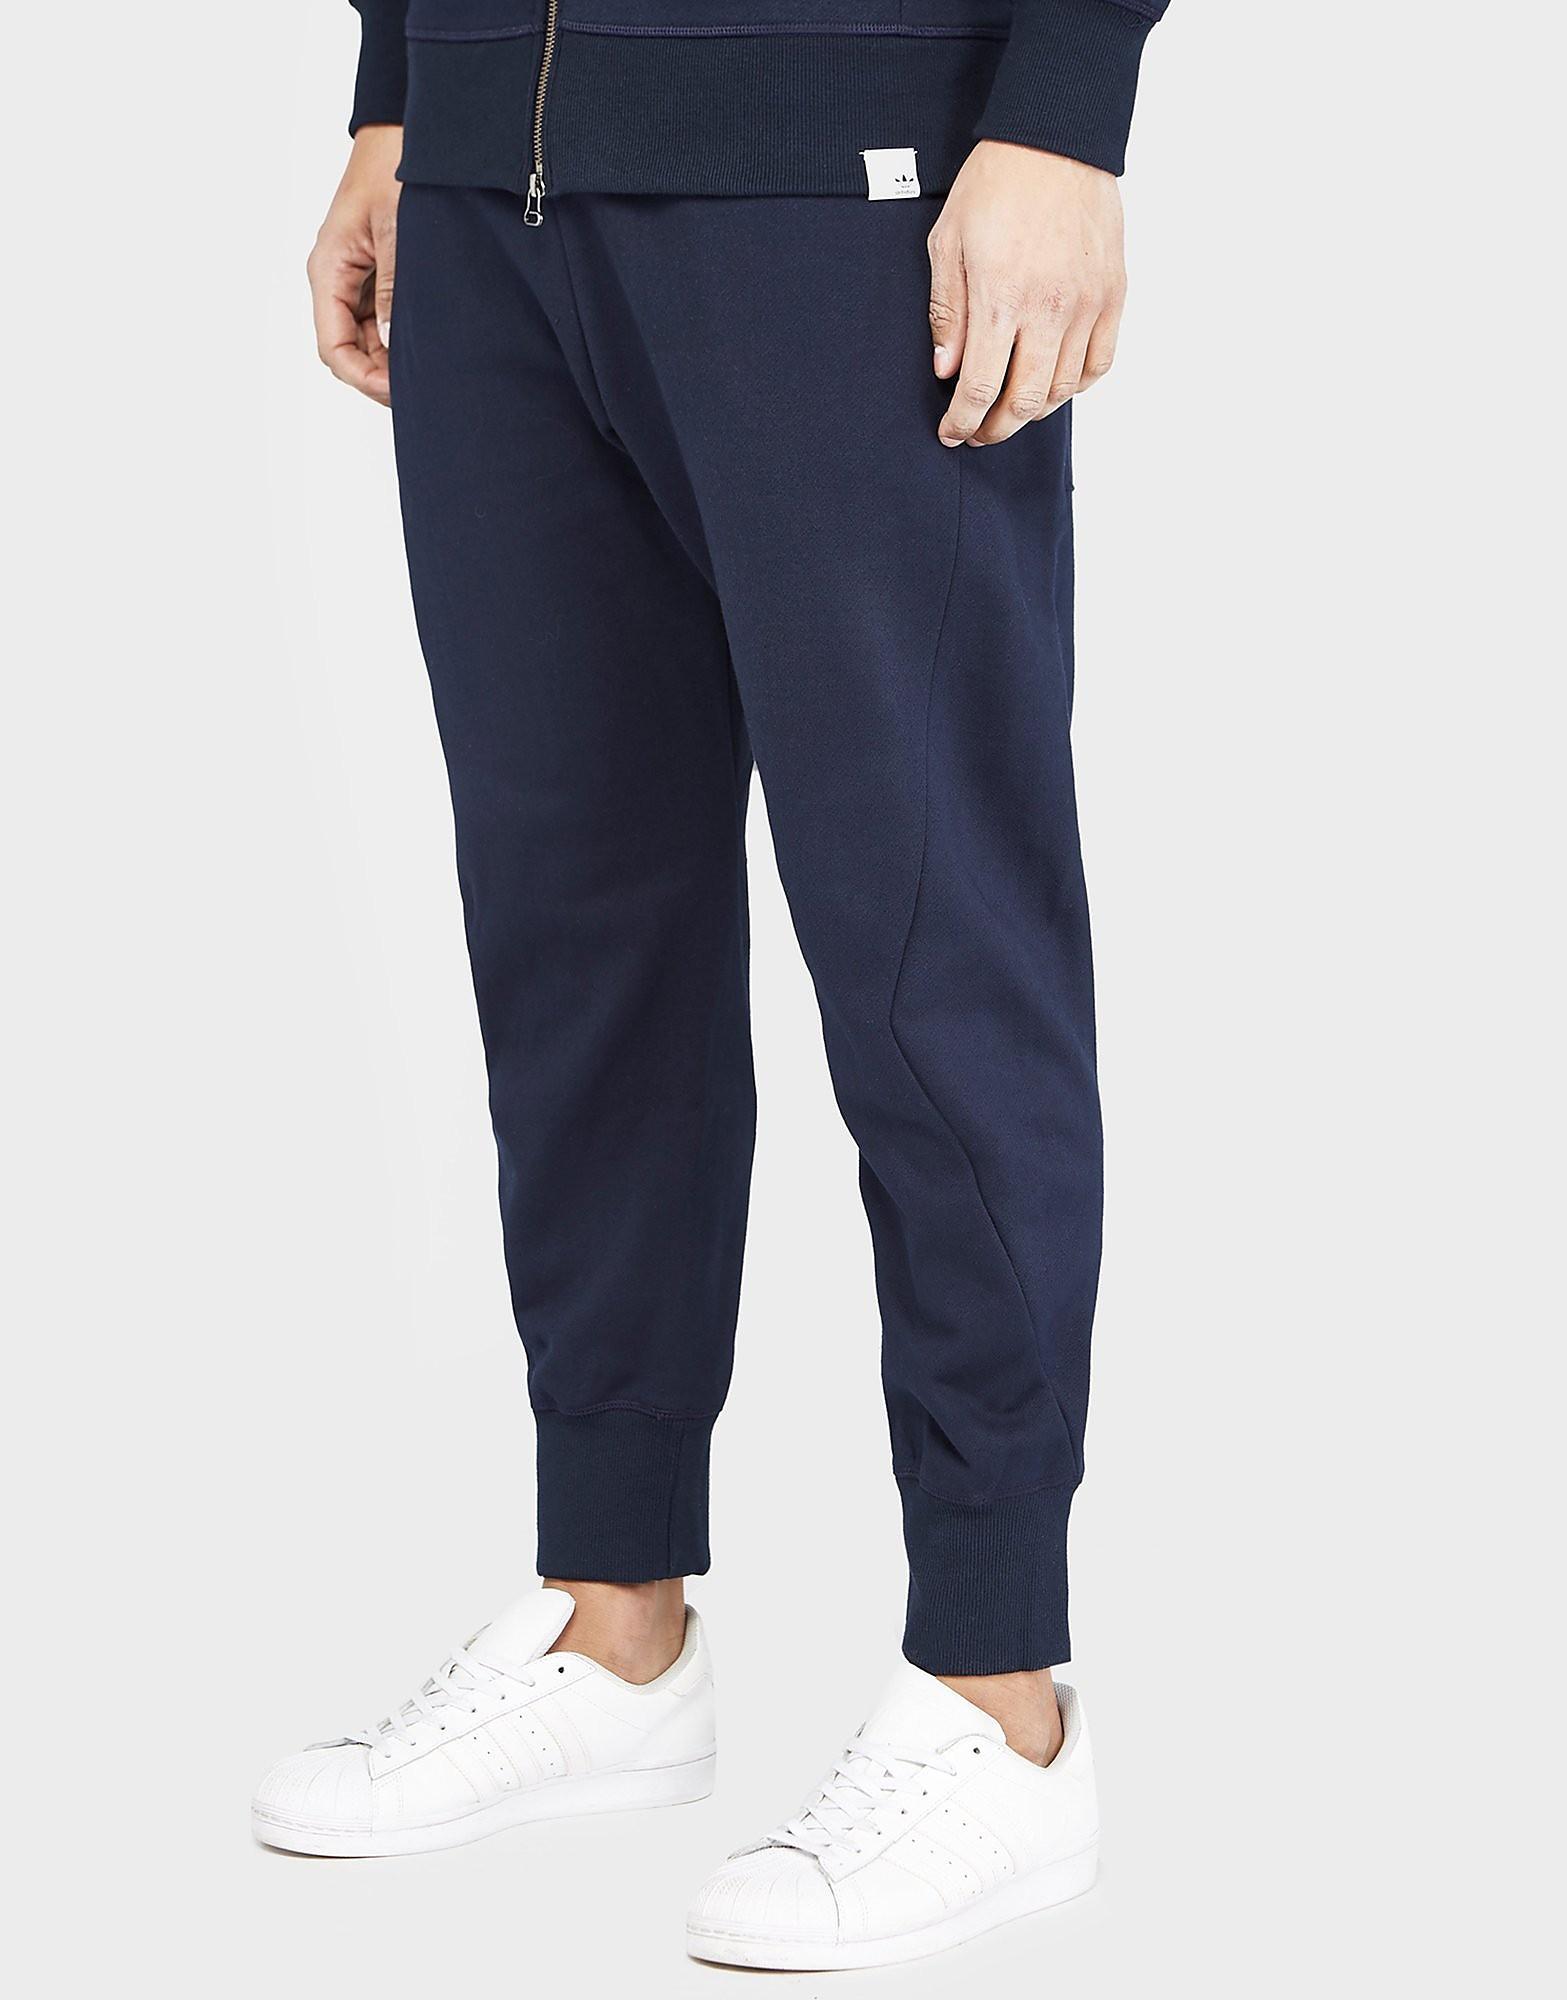 adidas Originals XBYO Sweat Pant